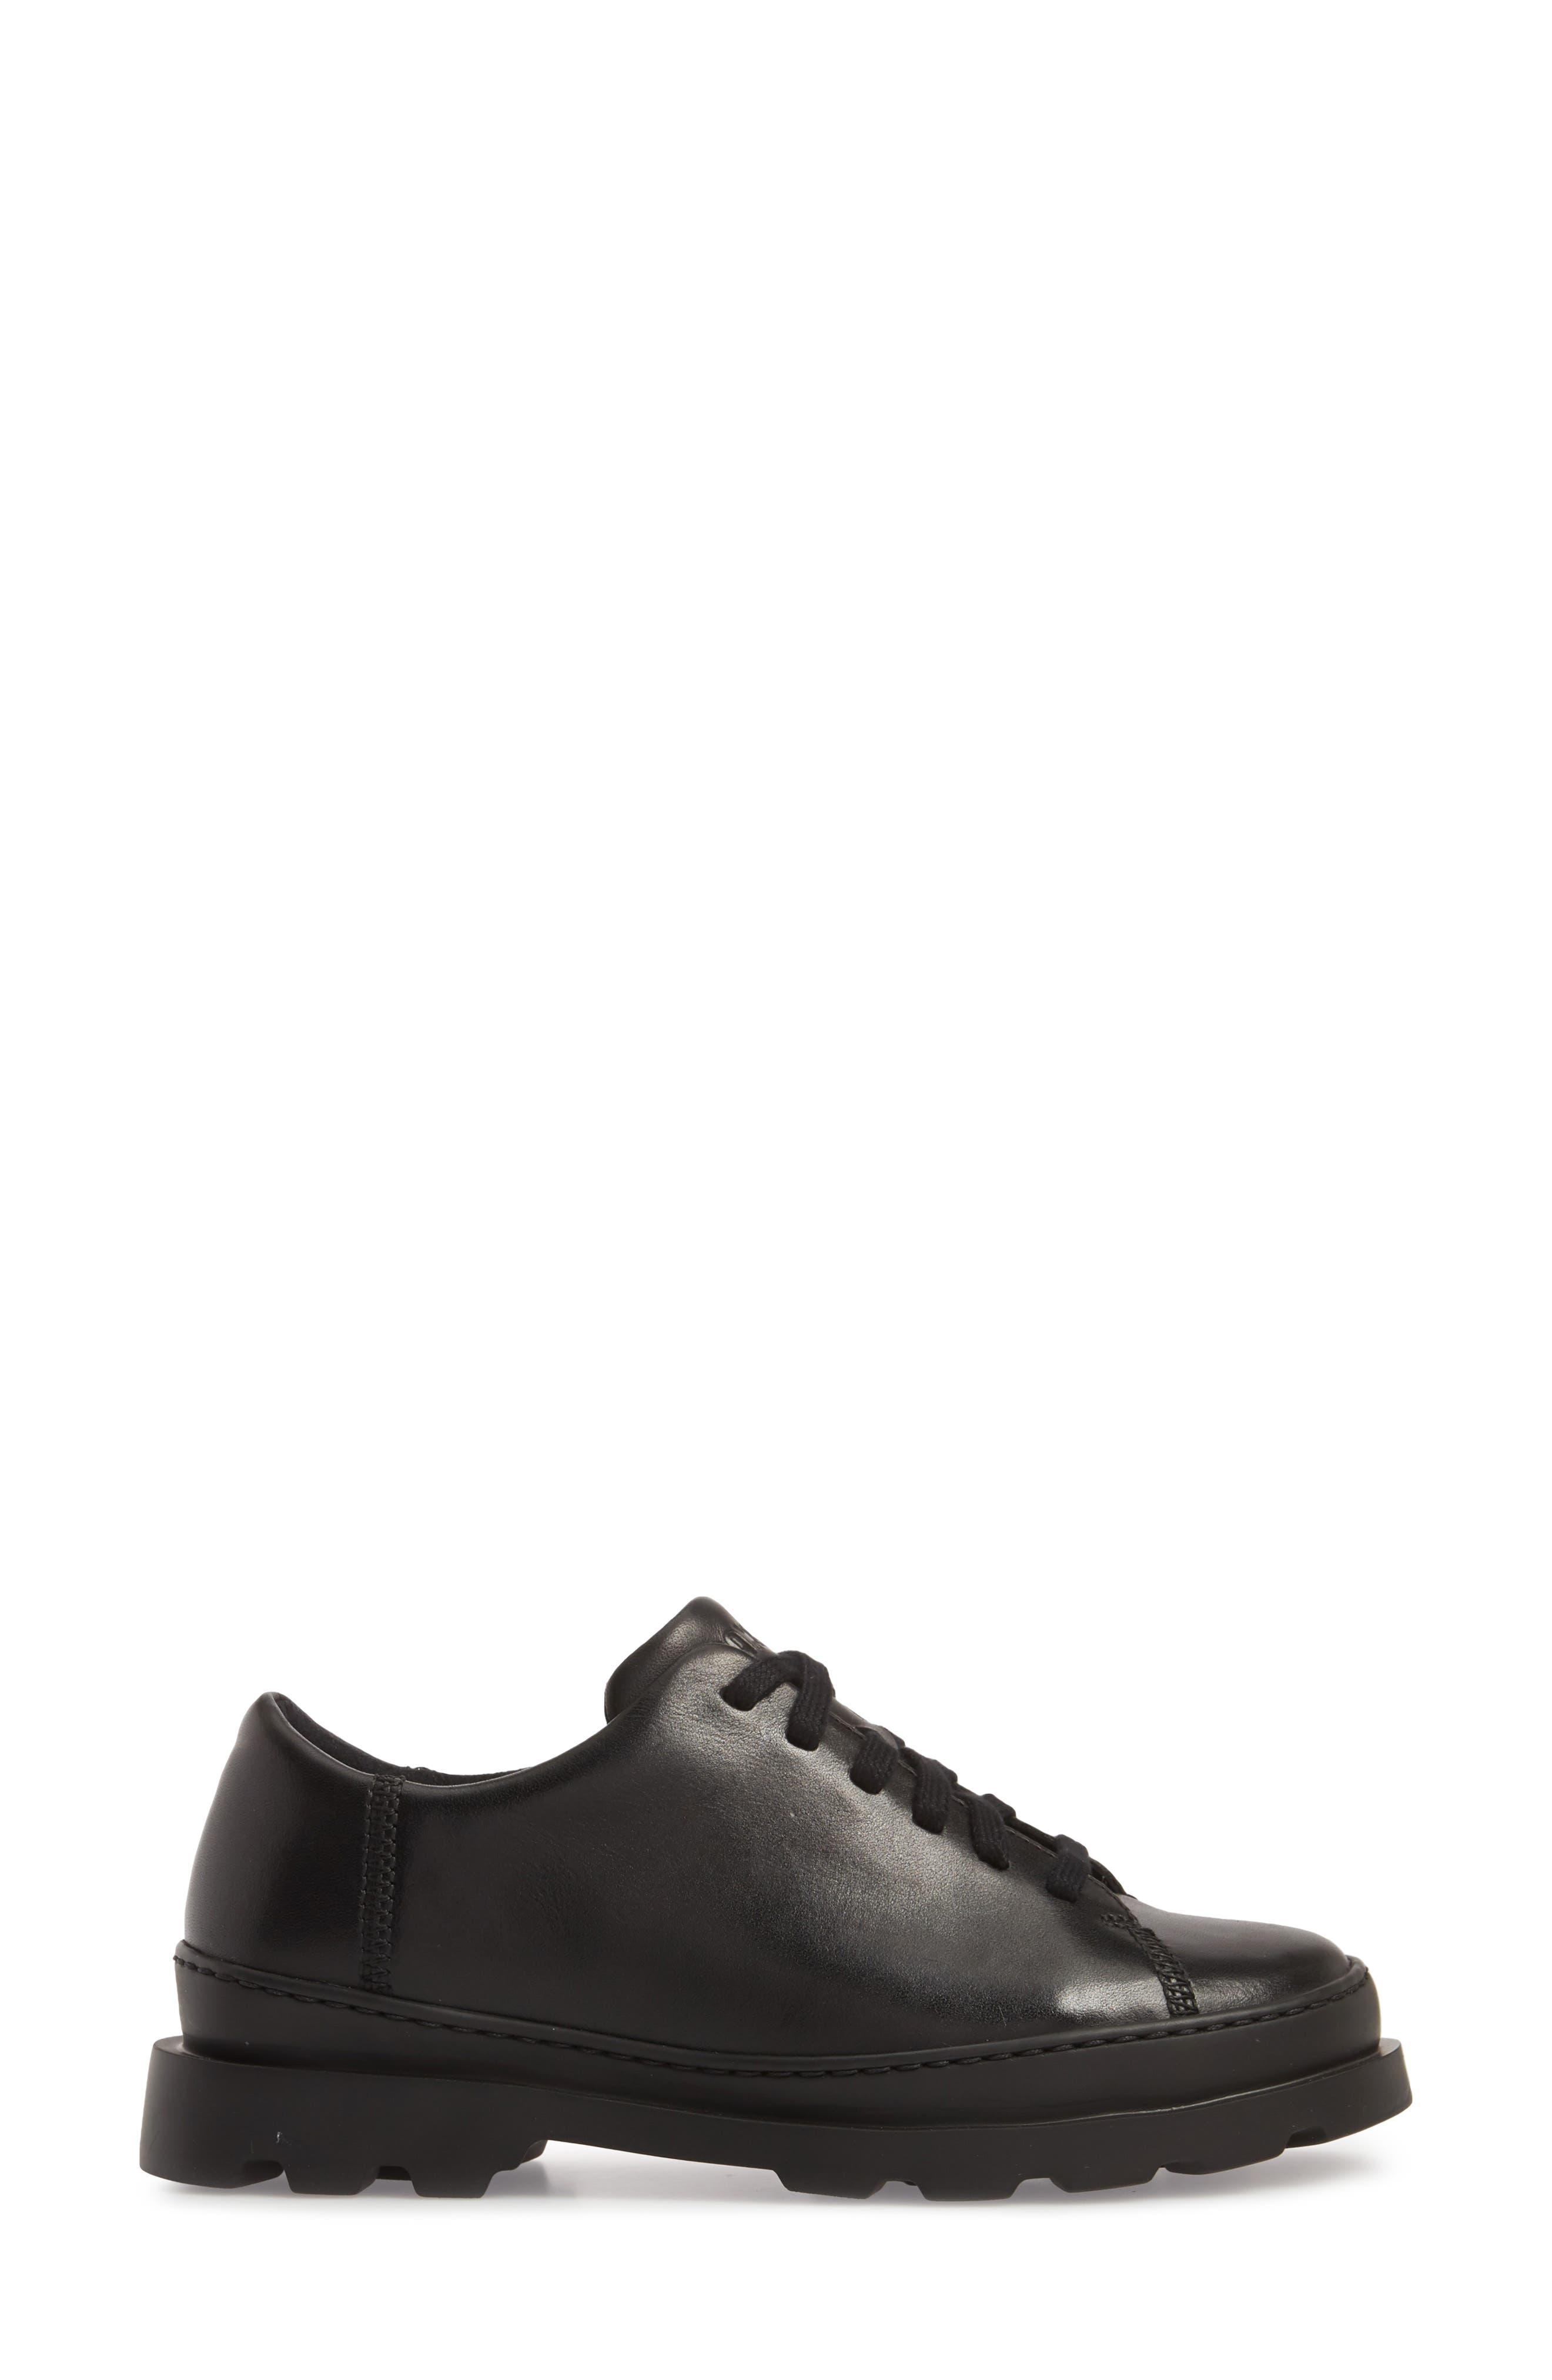 Brutus Sneaker,                             Alternate thumbnail 3, color,                             BLACK LEATHER